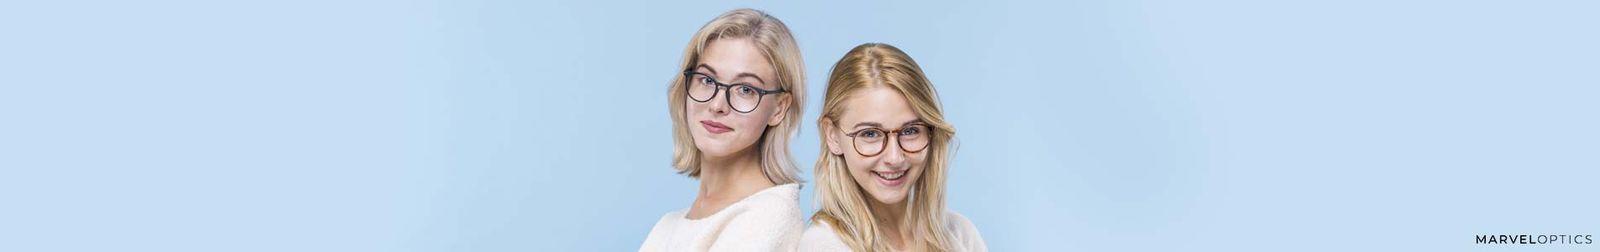 Top 5 Prescription Glasses of 2020 Header